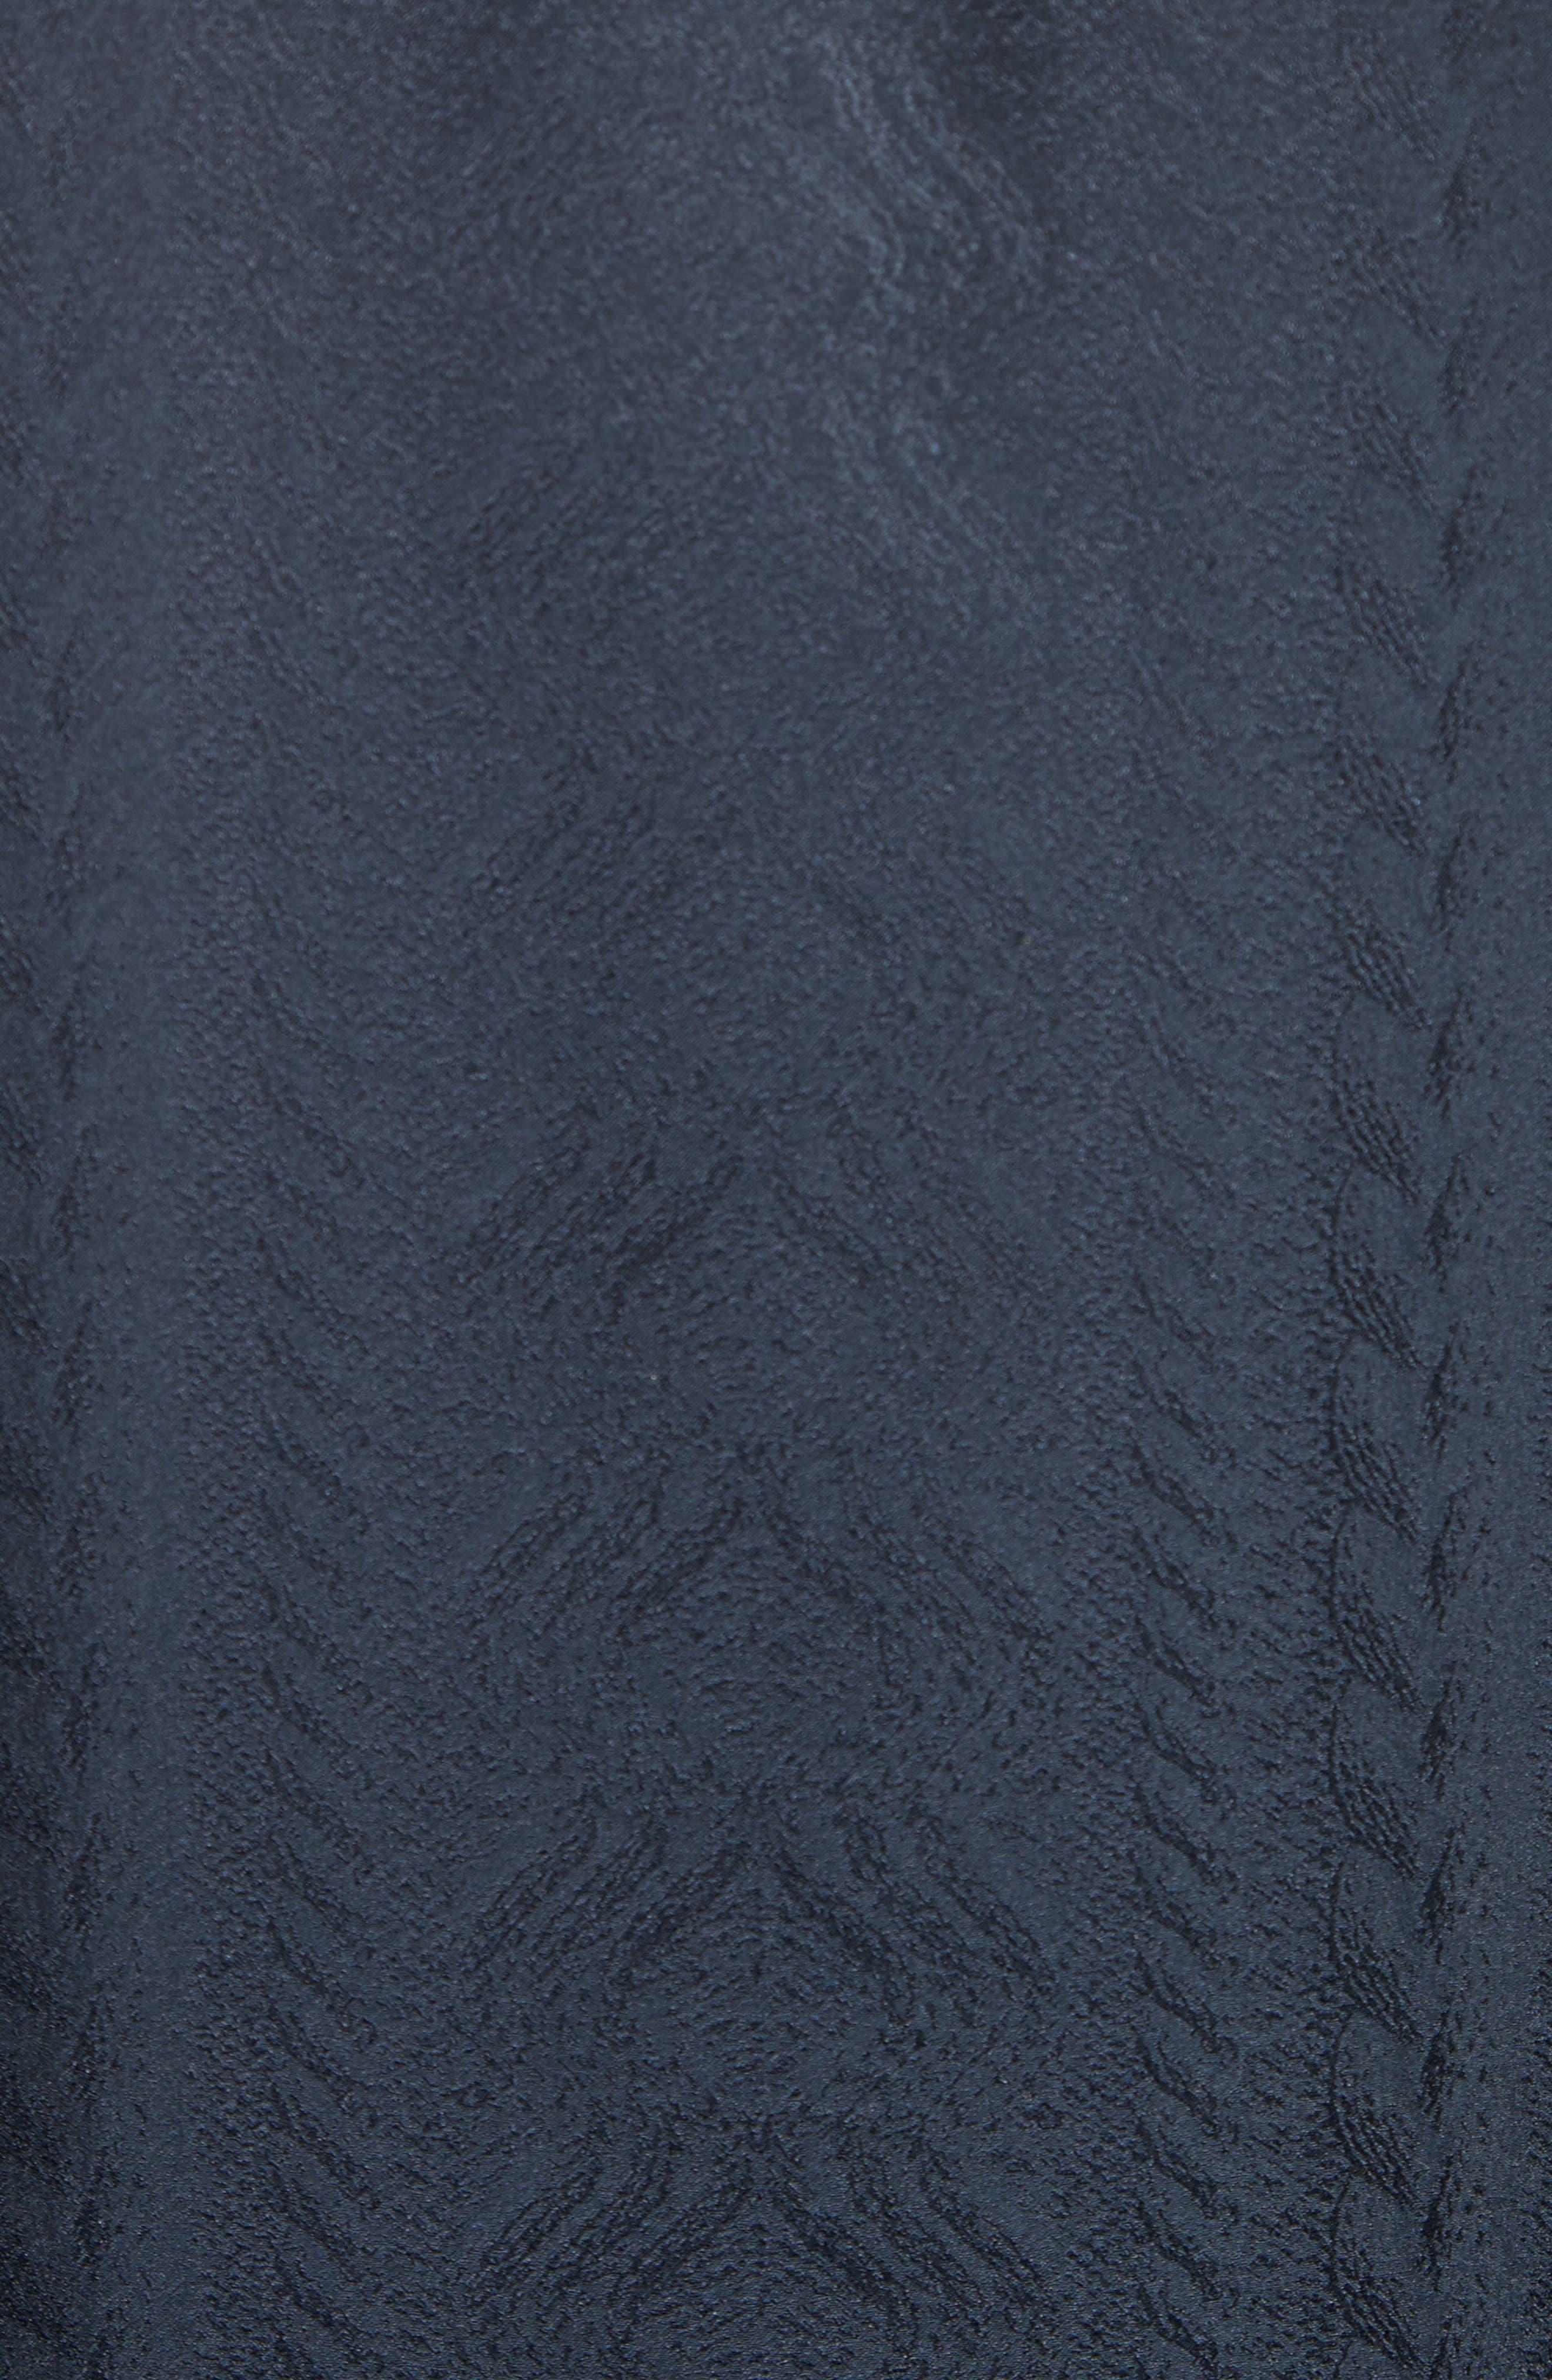 Embroidered Silk Jacquard Blouse,                             Alternate thumbnail 5, color,                             001